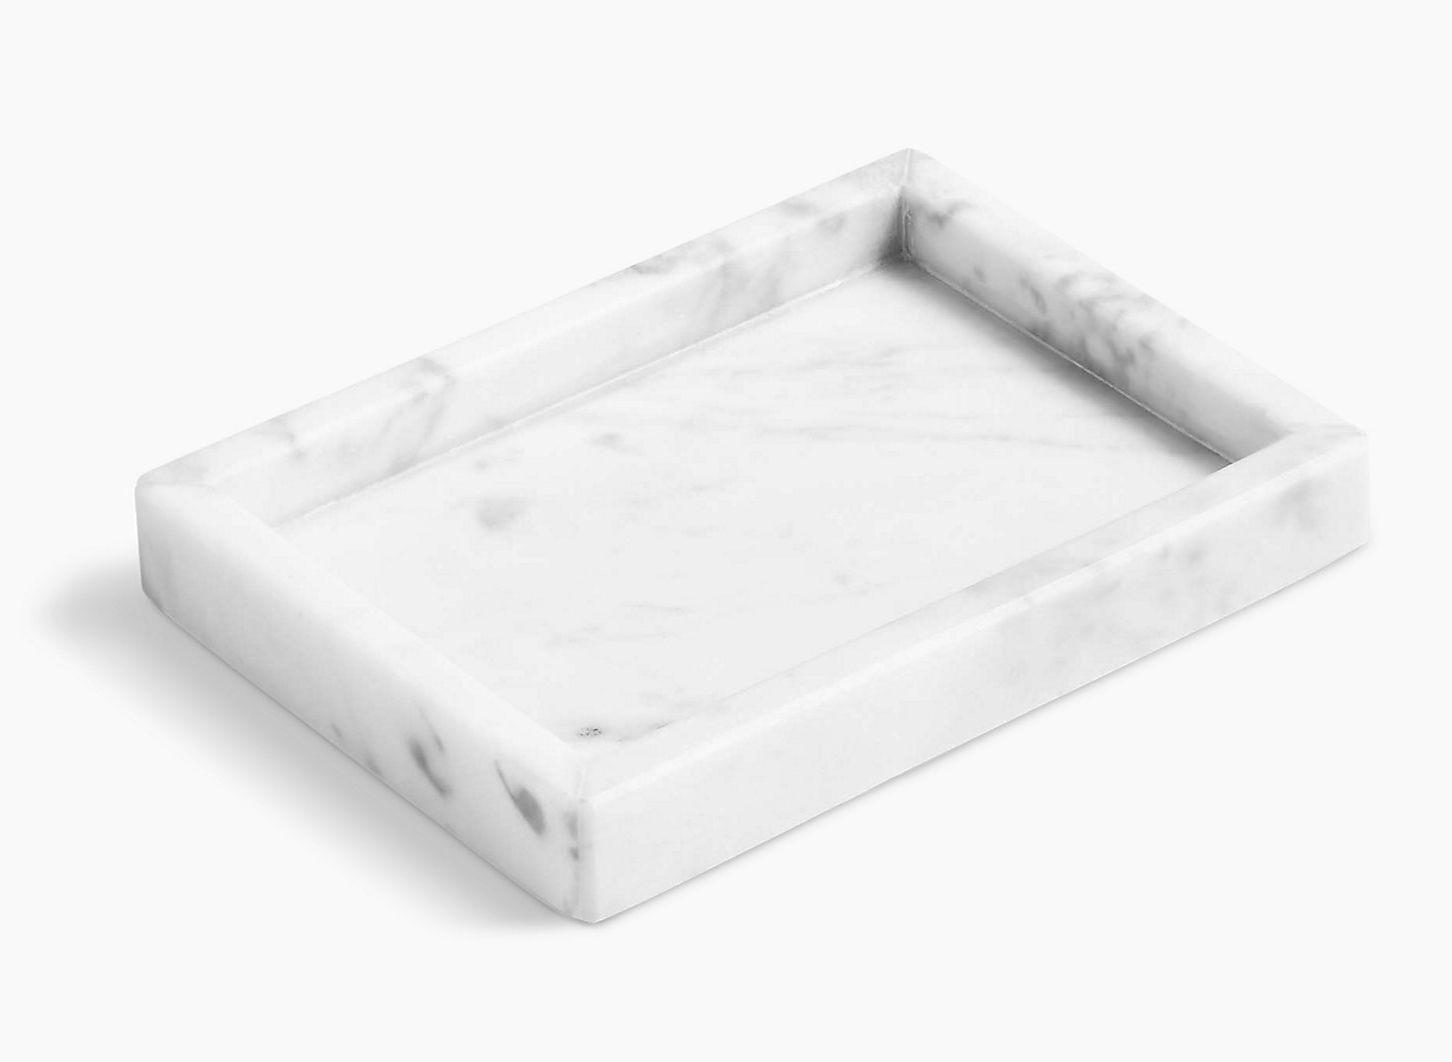 GREY-MARBLE-SOAP-DISH